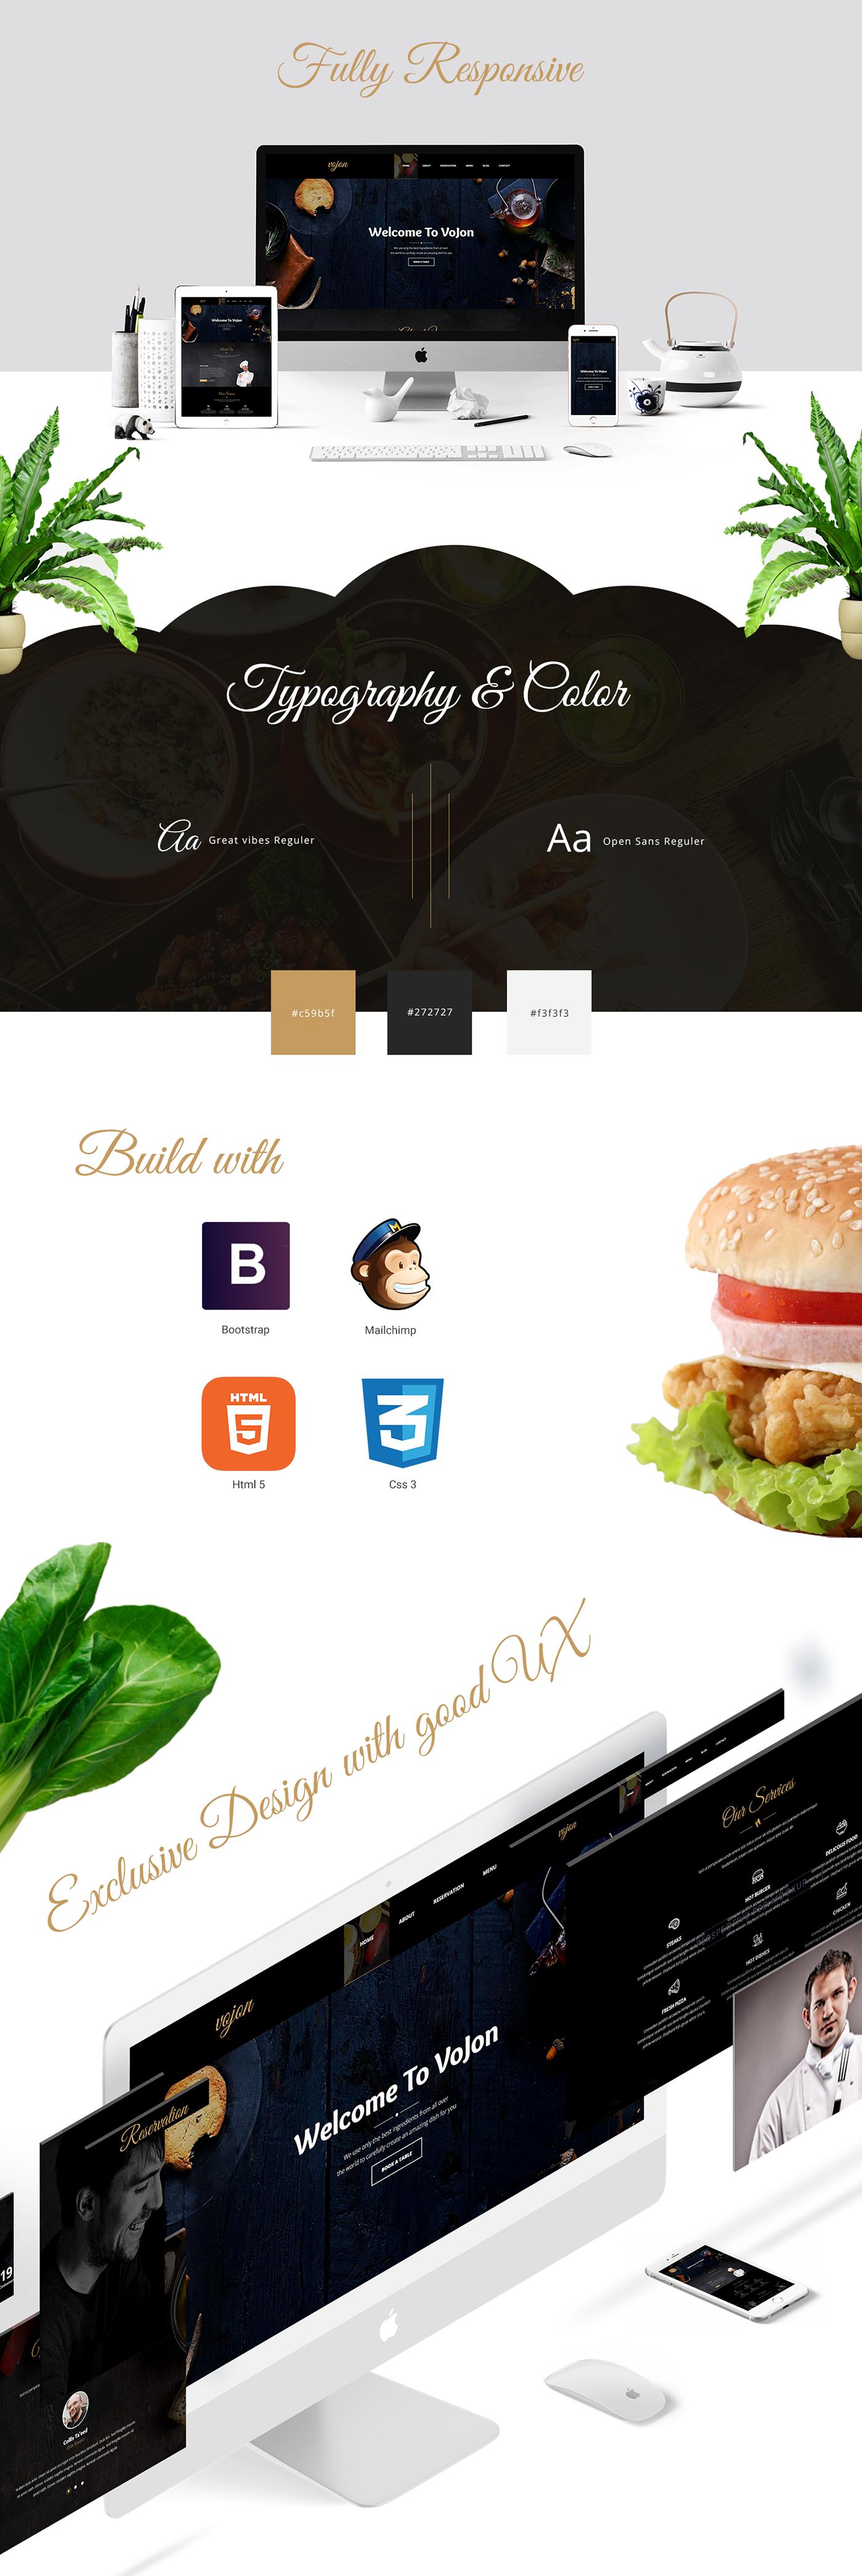 free freebie Free Template free html template HTML Template restaurant template UI ux restaurant design